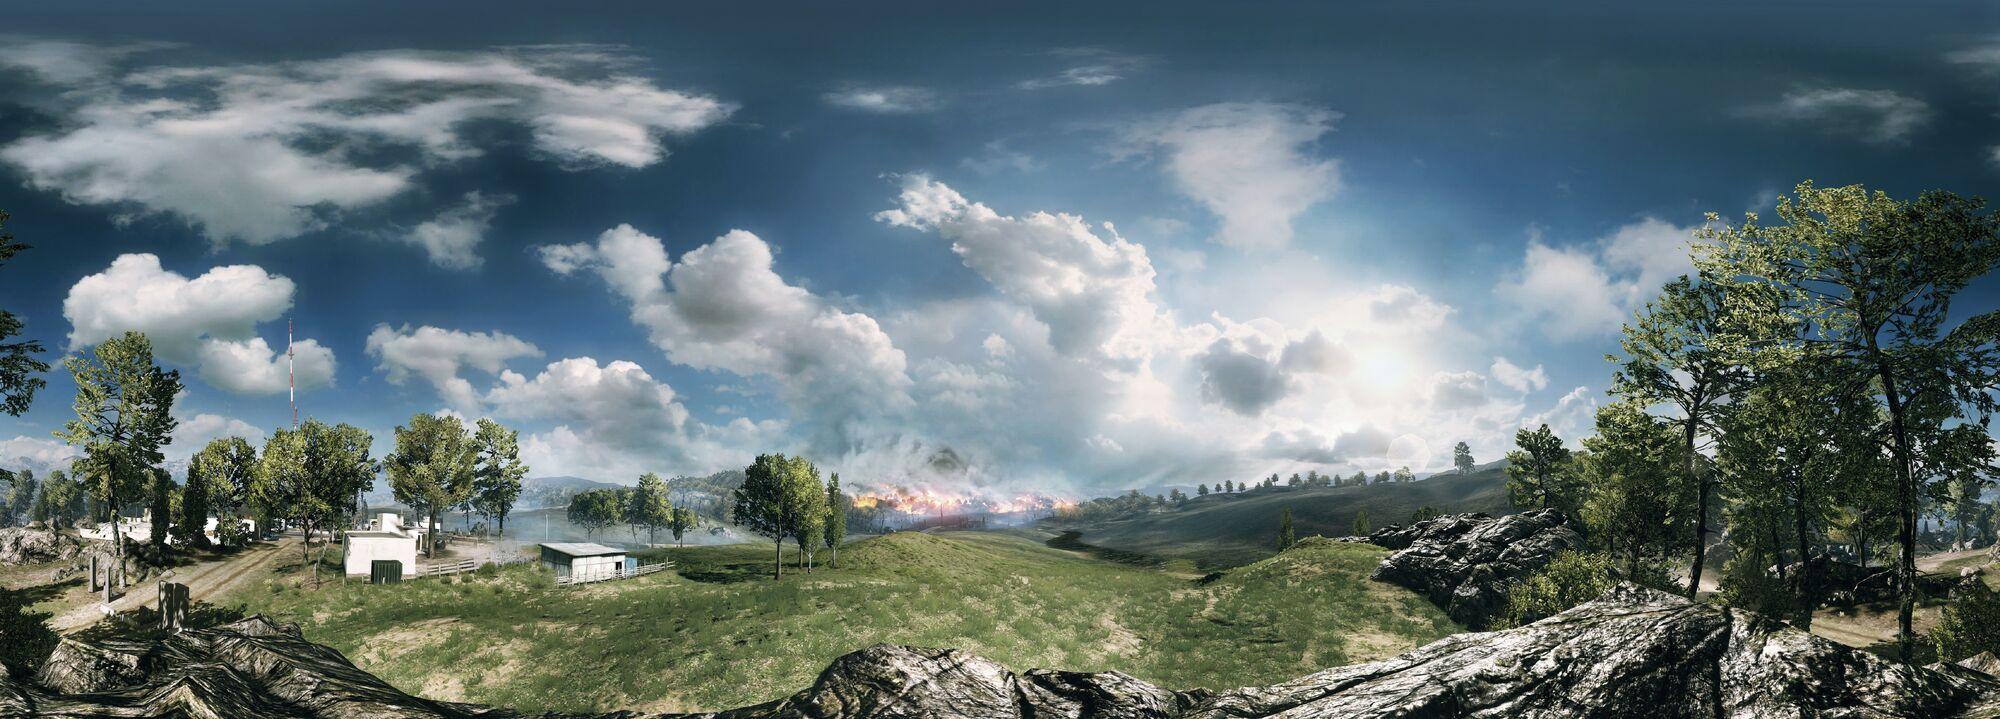 Battlefield 3 Panorama Caspian Border.jpg